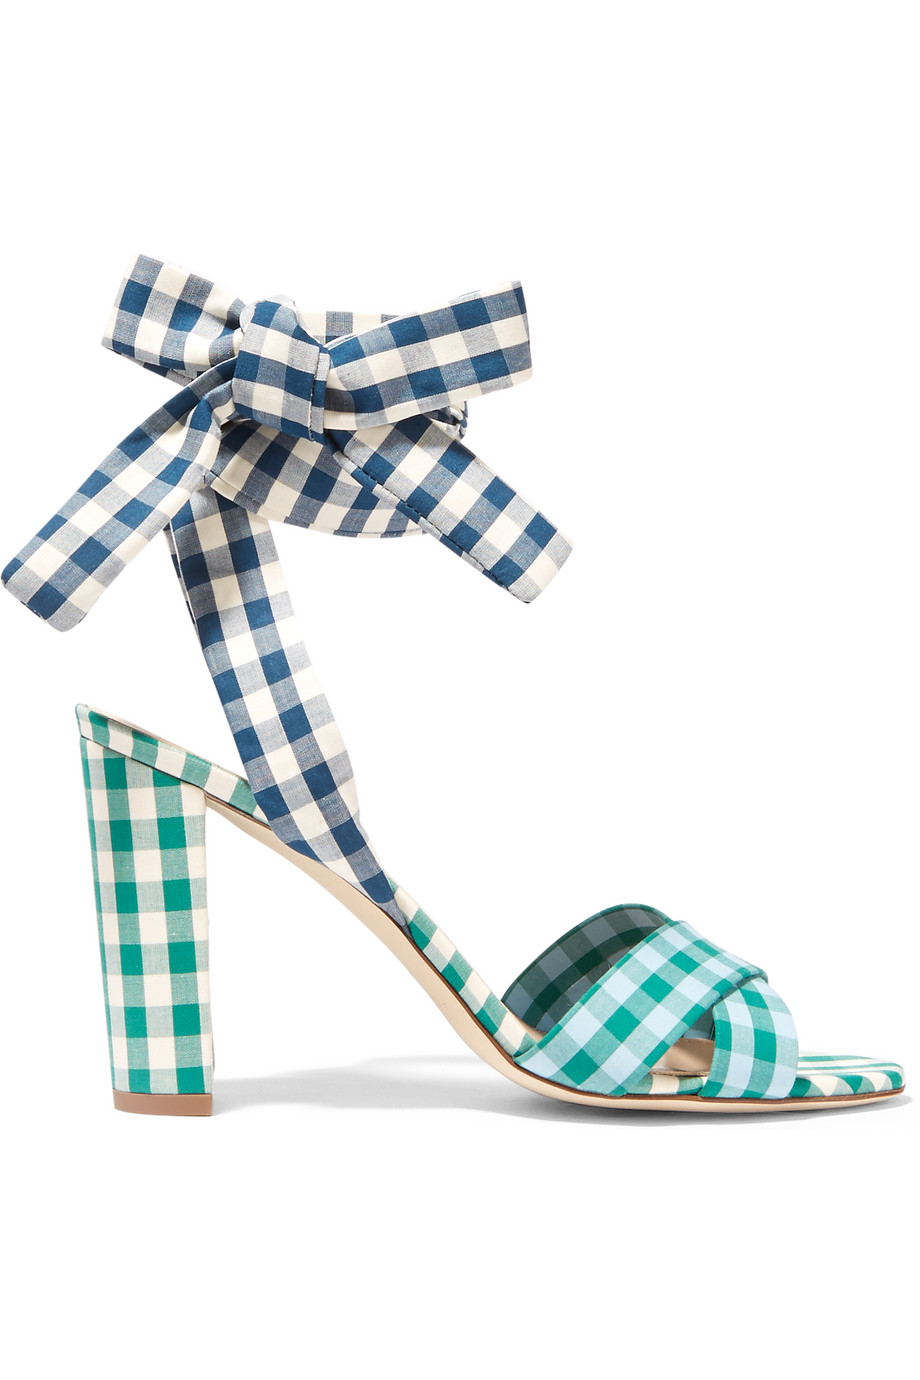 J.Crew Charlotte Gingham Poplin Sandals, Blue, Women's, Size: 6